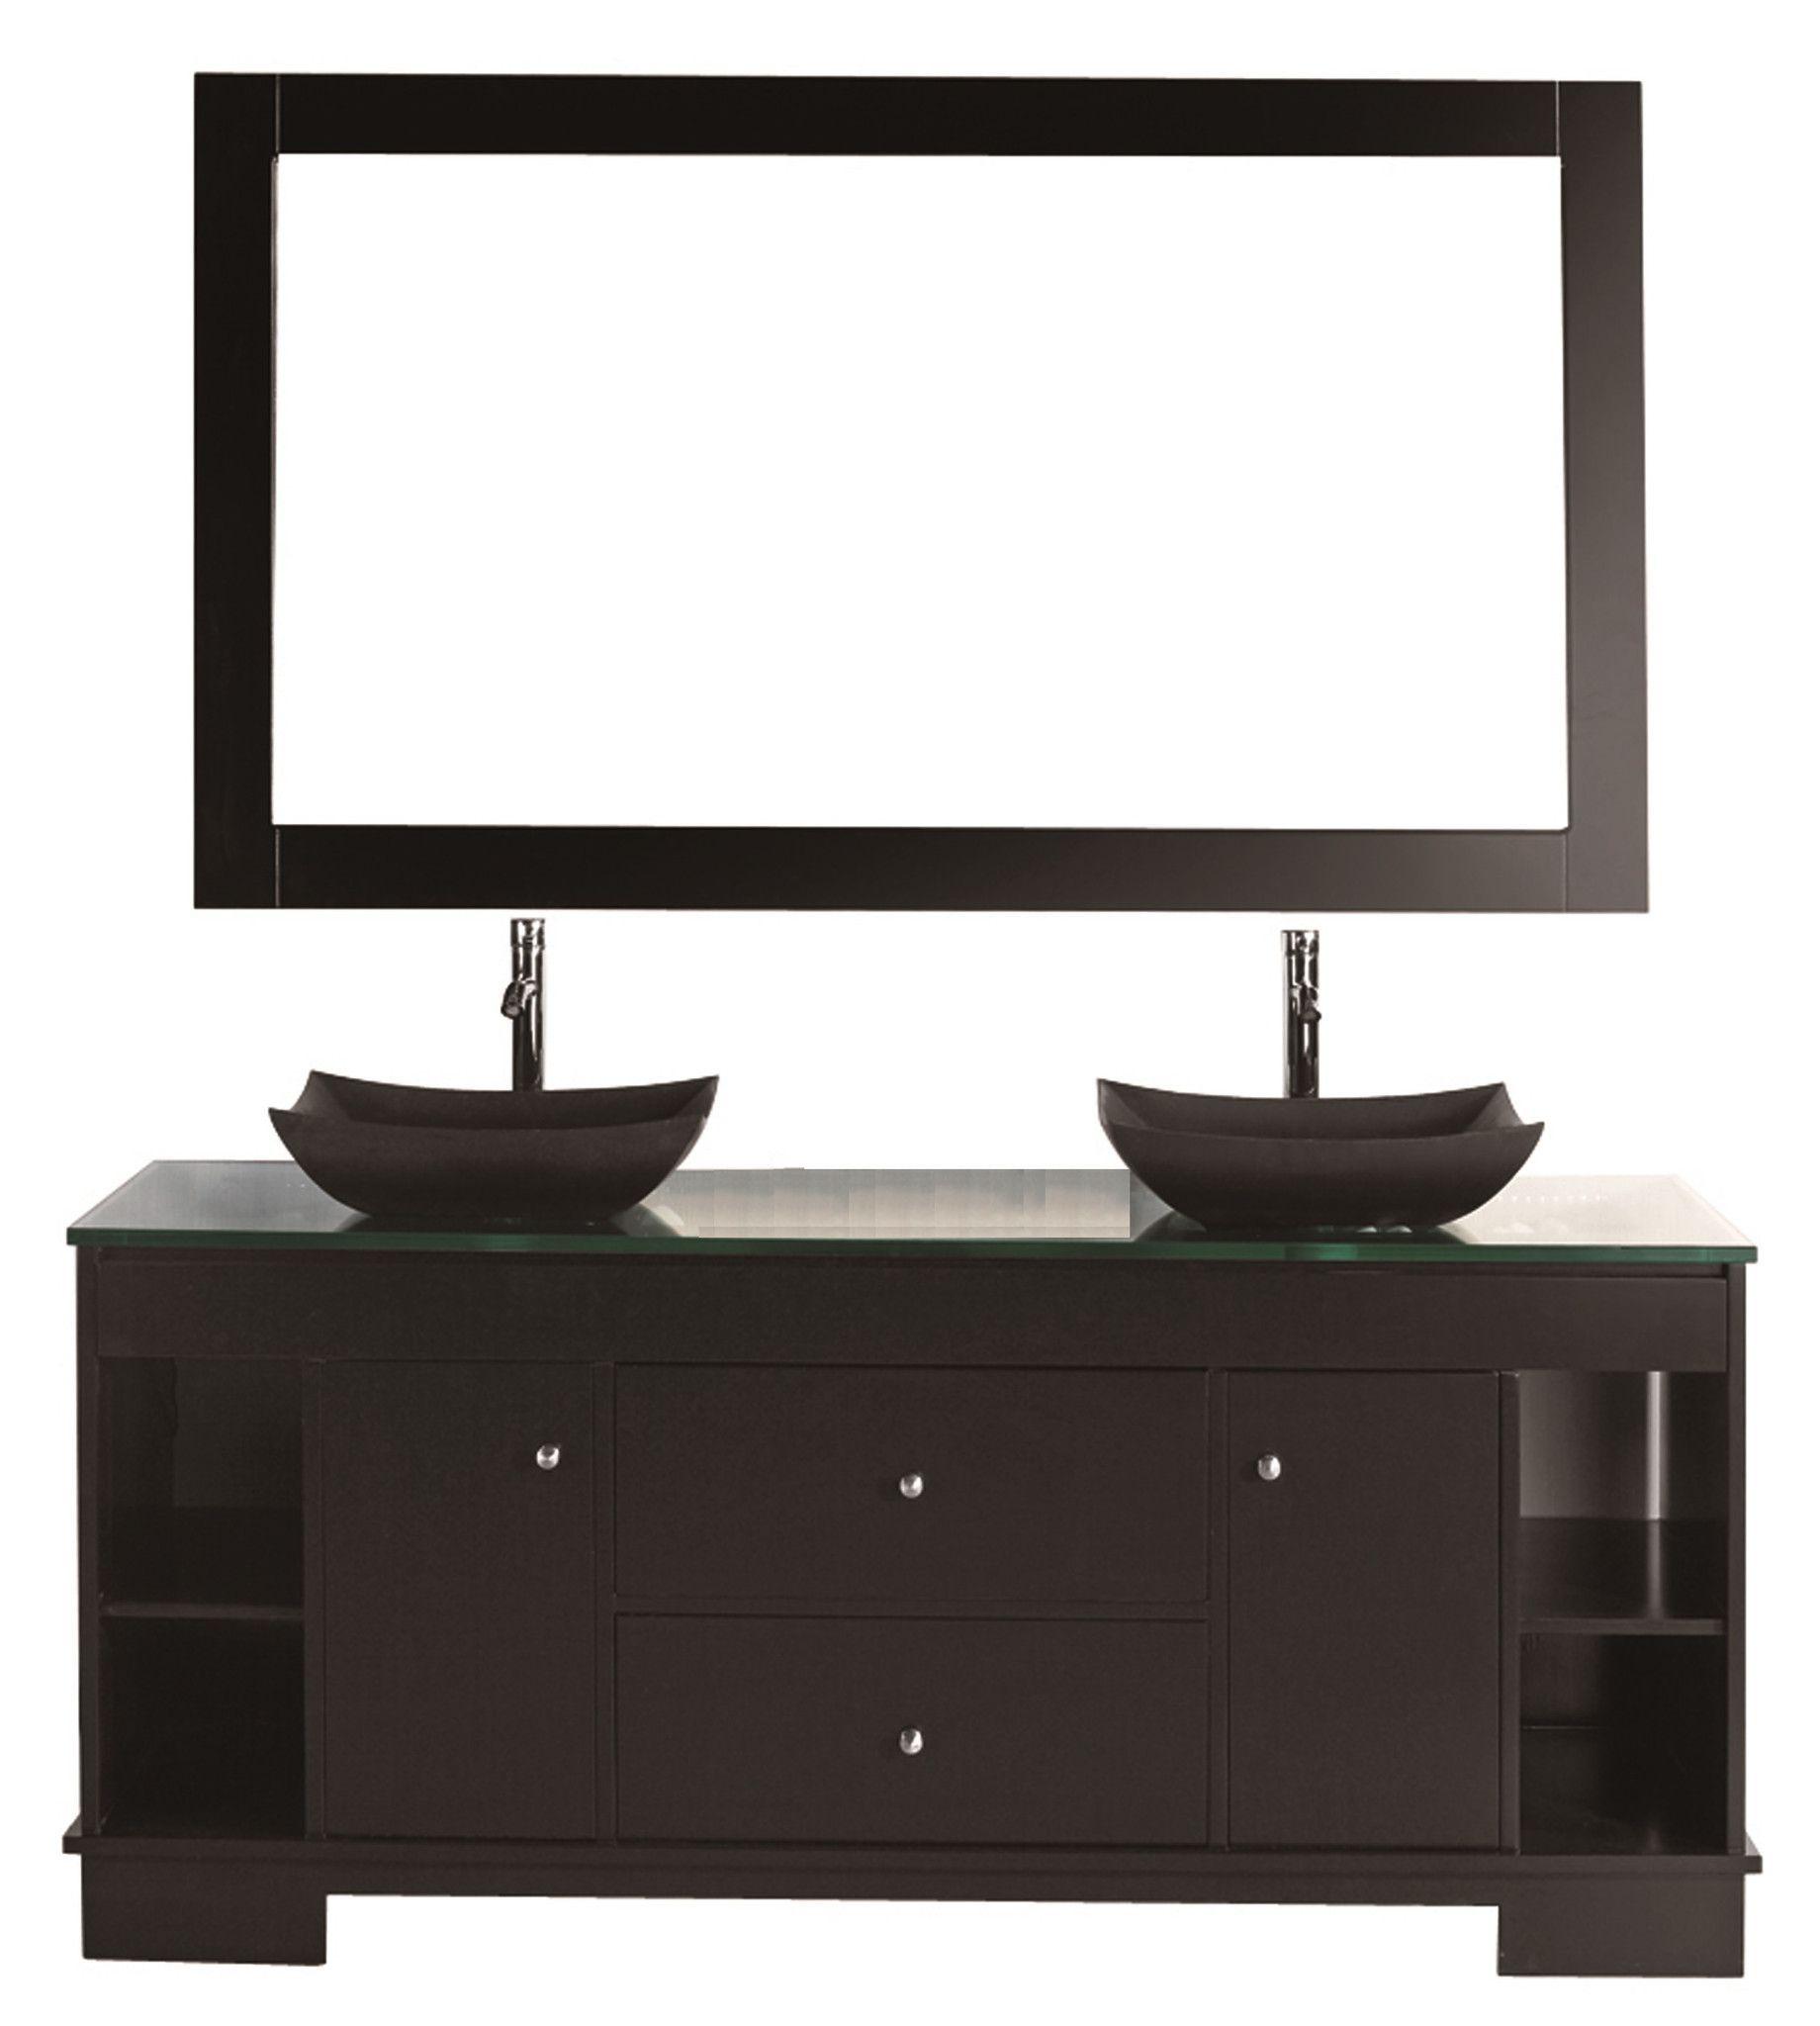 "Oasis 60"" Double Sink Vanity Set in Espresso with Mirror"